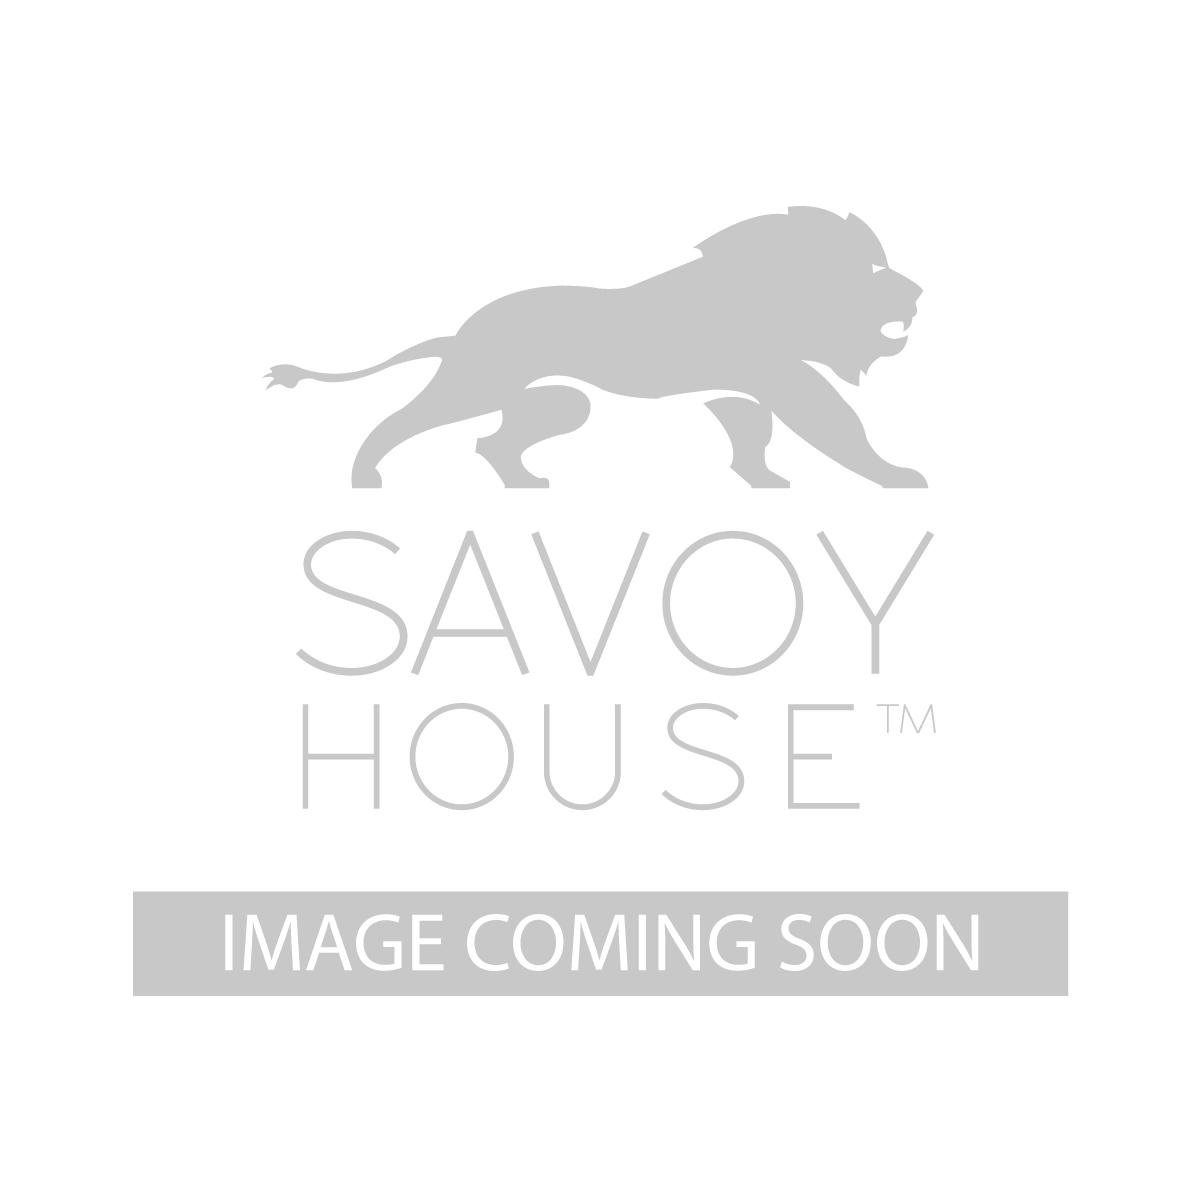 1 2100 6 70 Eden 6 Light Outdoor Chandelier By Savoy House